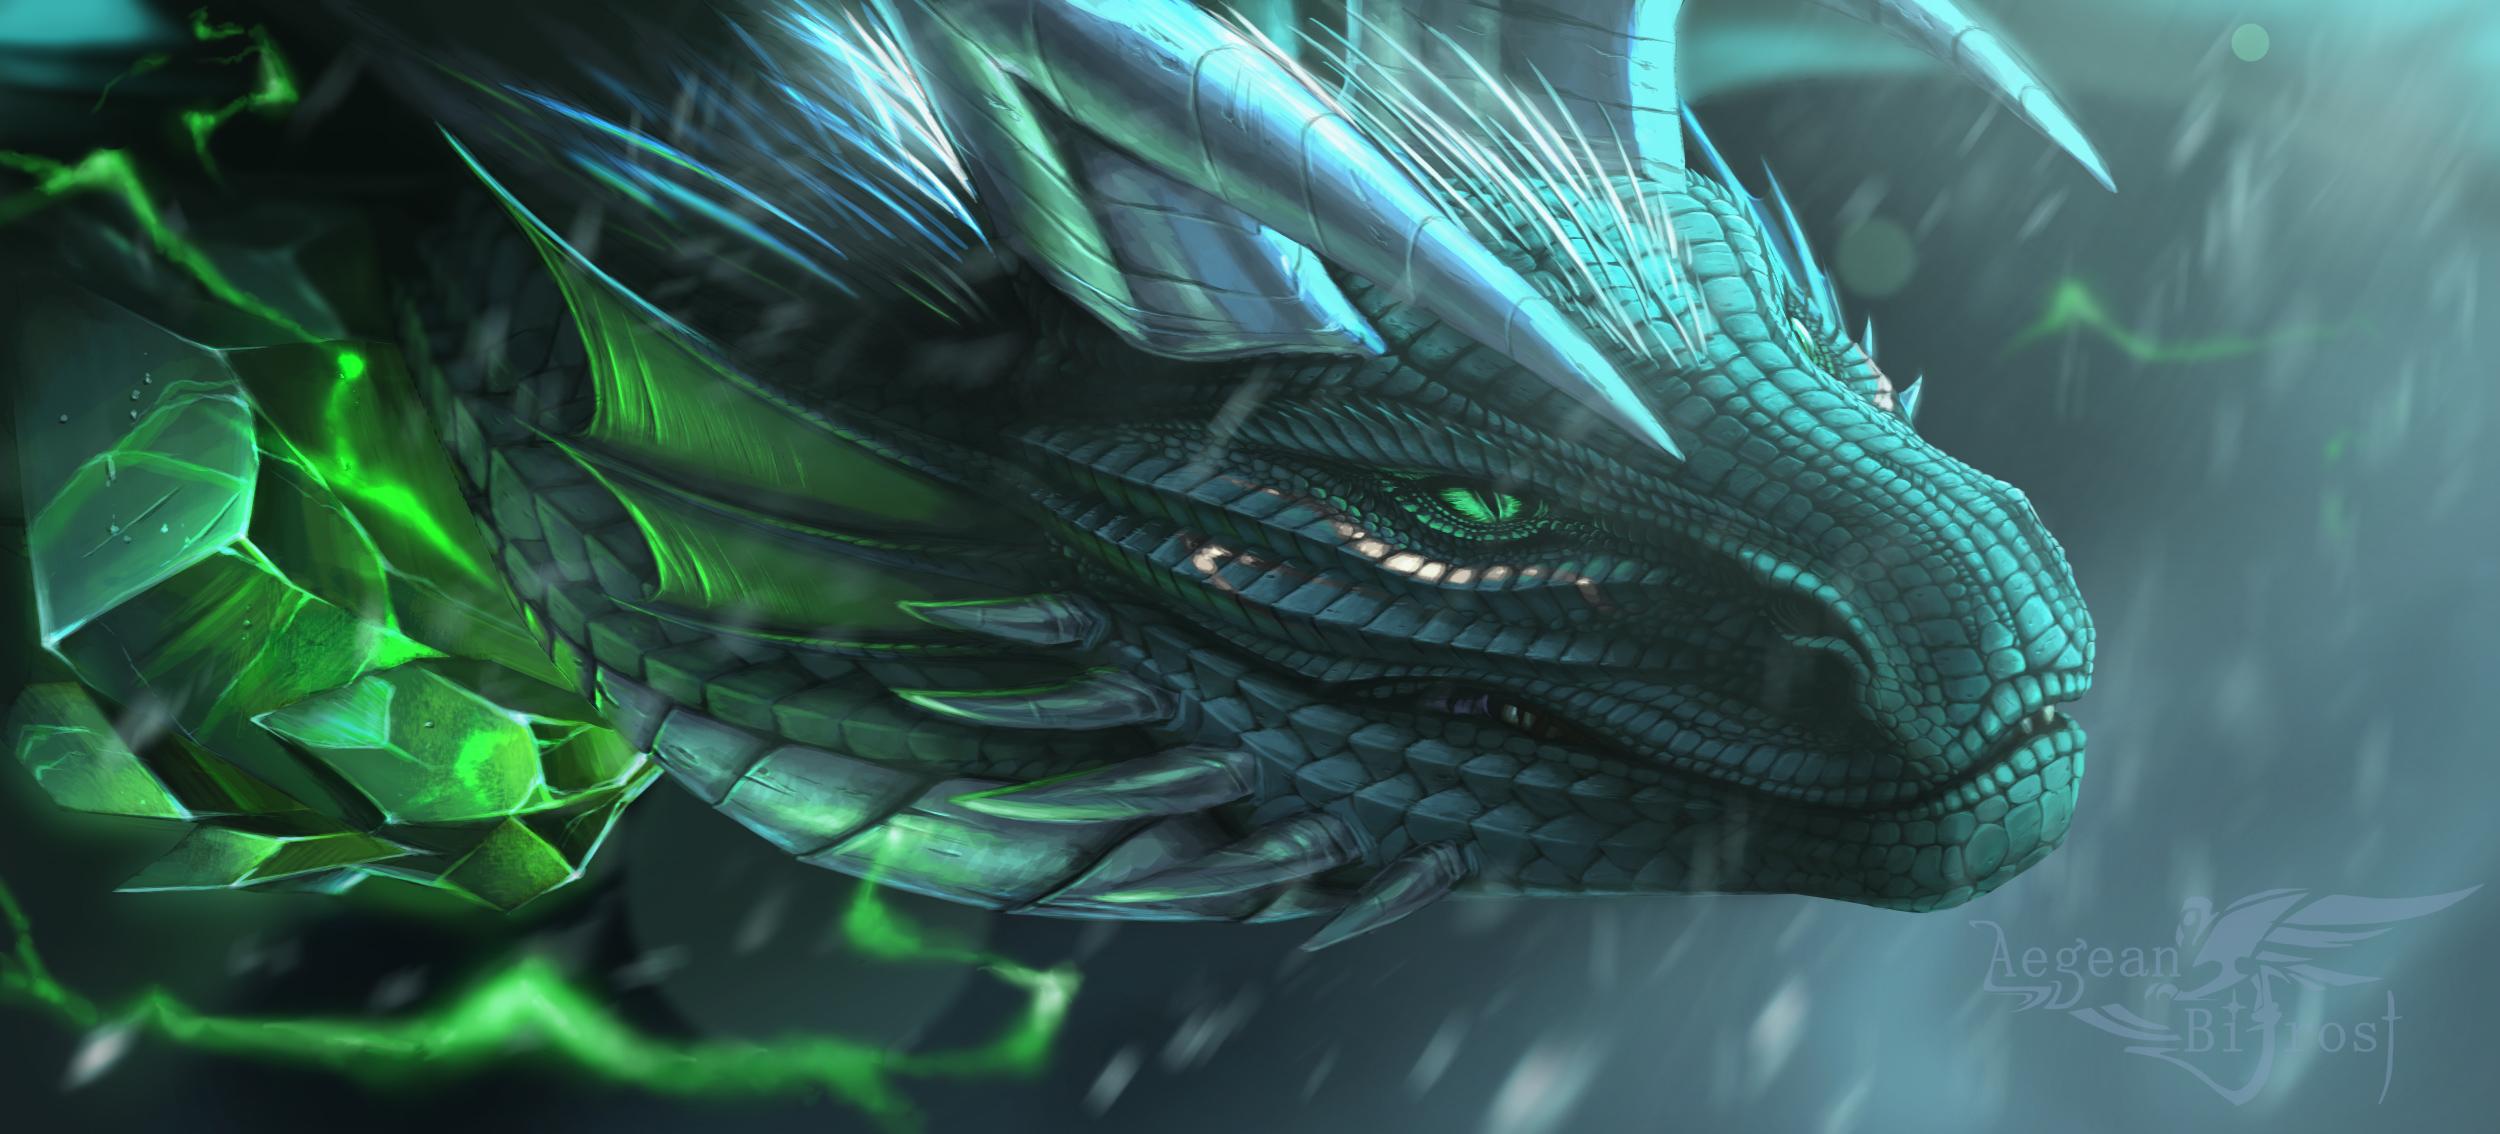 Chinese Dragon Wallpaper Hd Dragon Digital Arts Hd Artist 4k Wallpapers Images